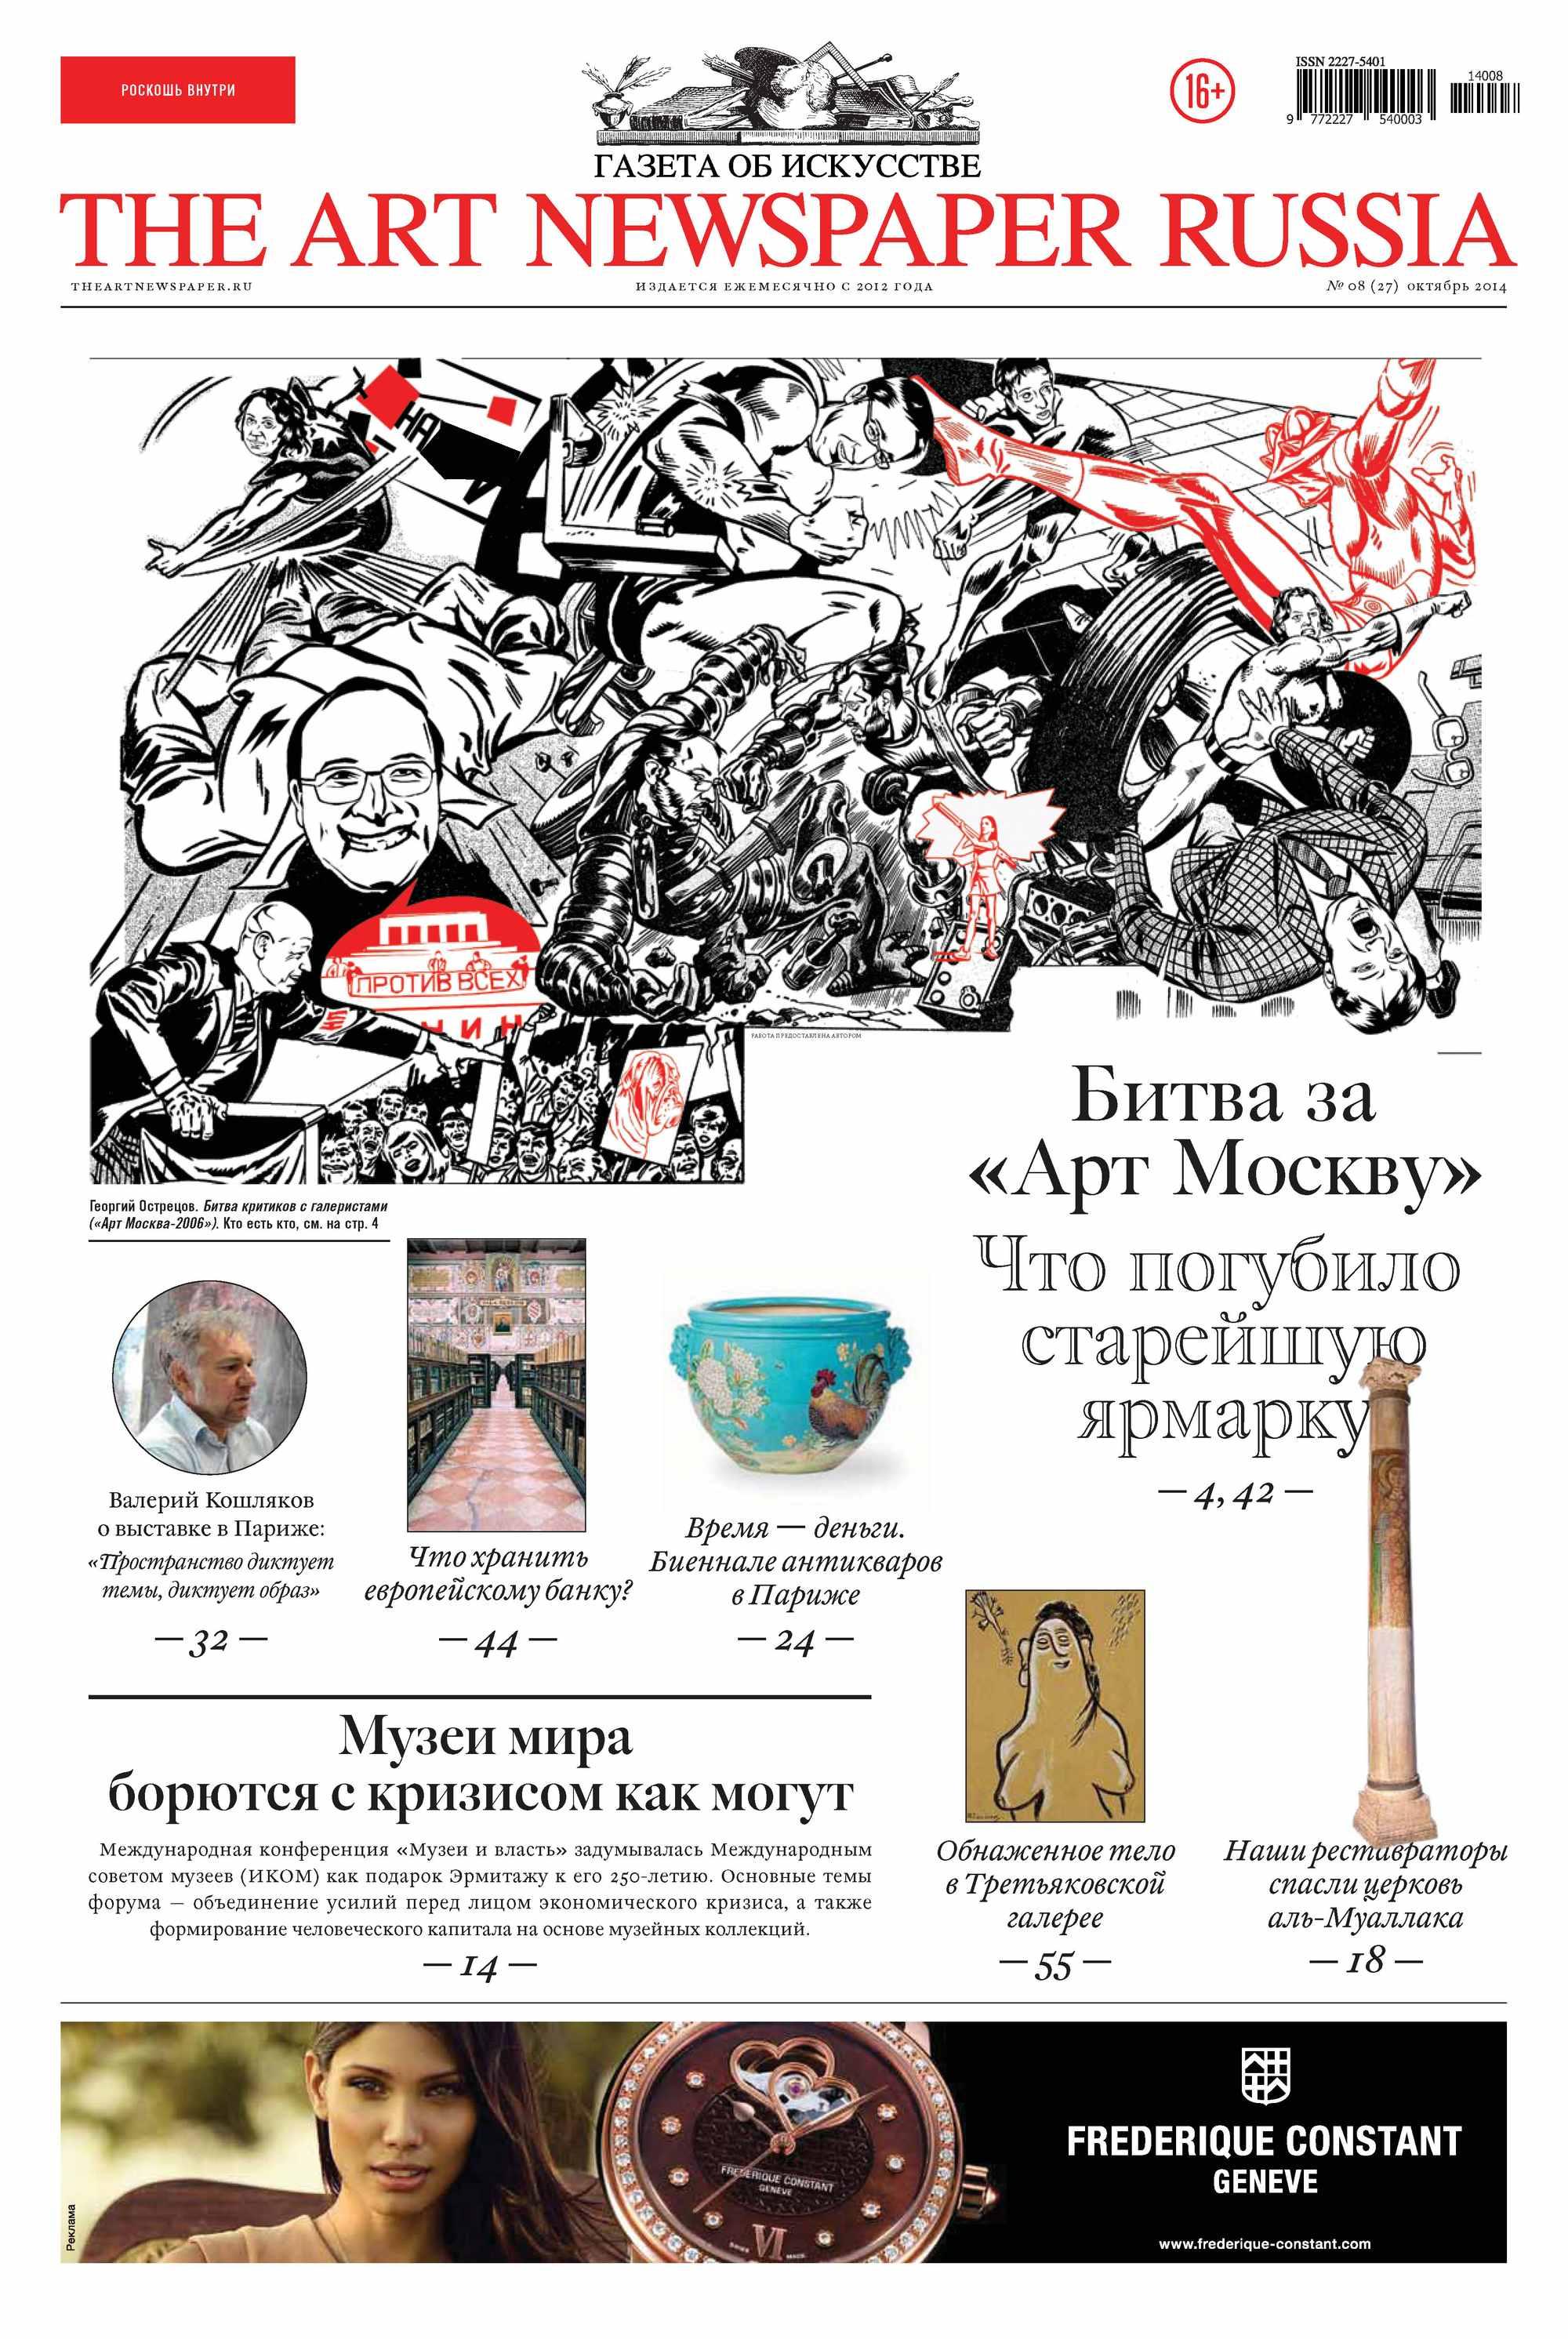 The Art Newspaper Russia №08 / октябрь 2014